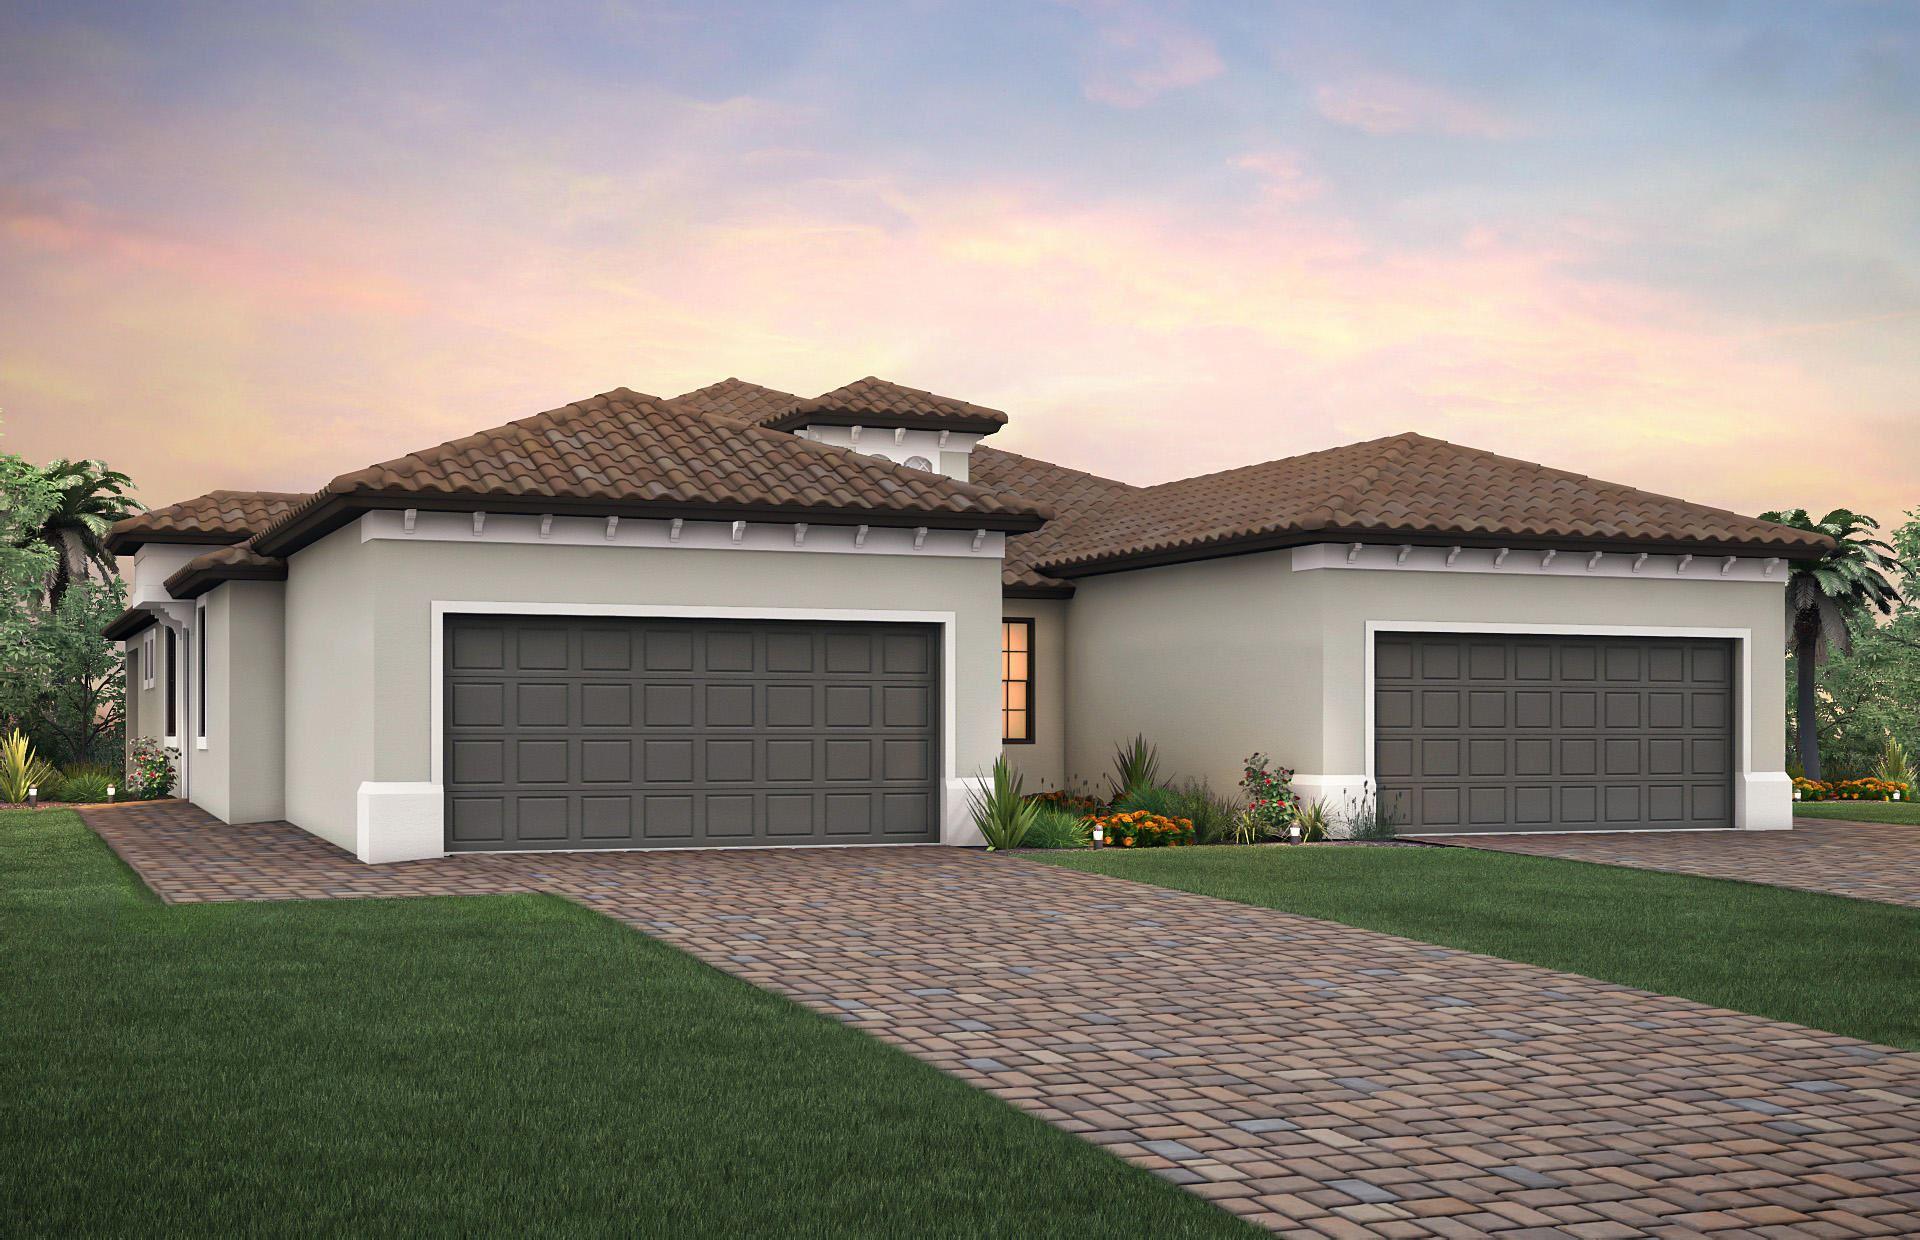 9177 Passiflora Way, Boca Raton, FL 33428 - #: RX-10640823